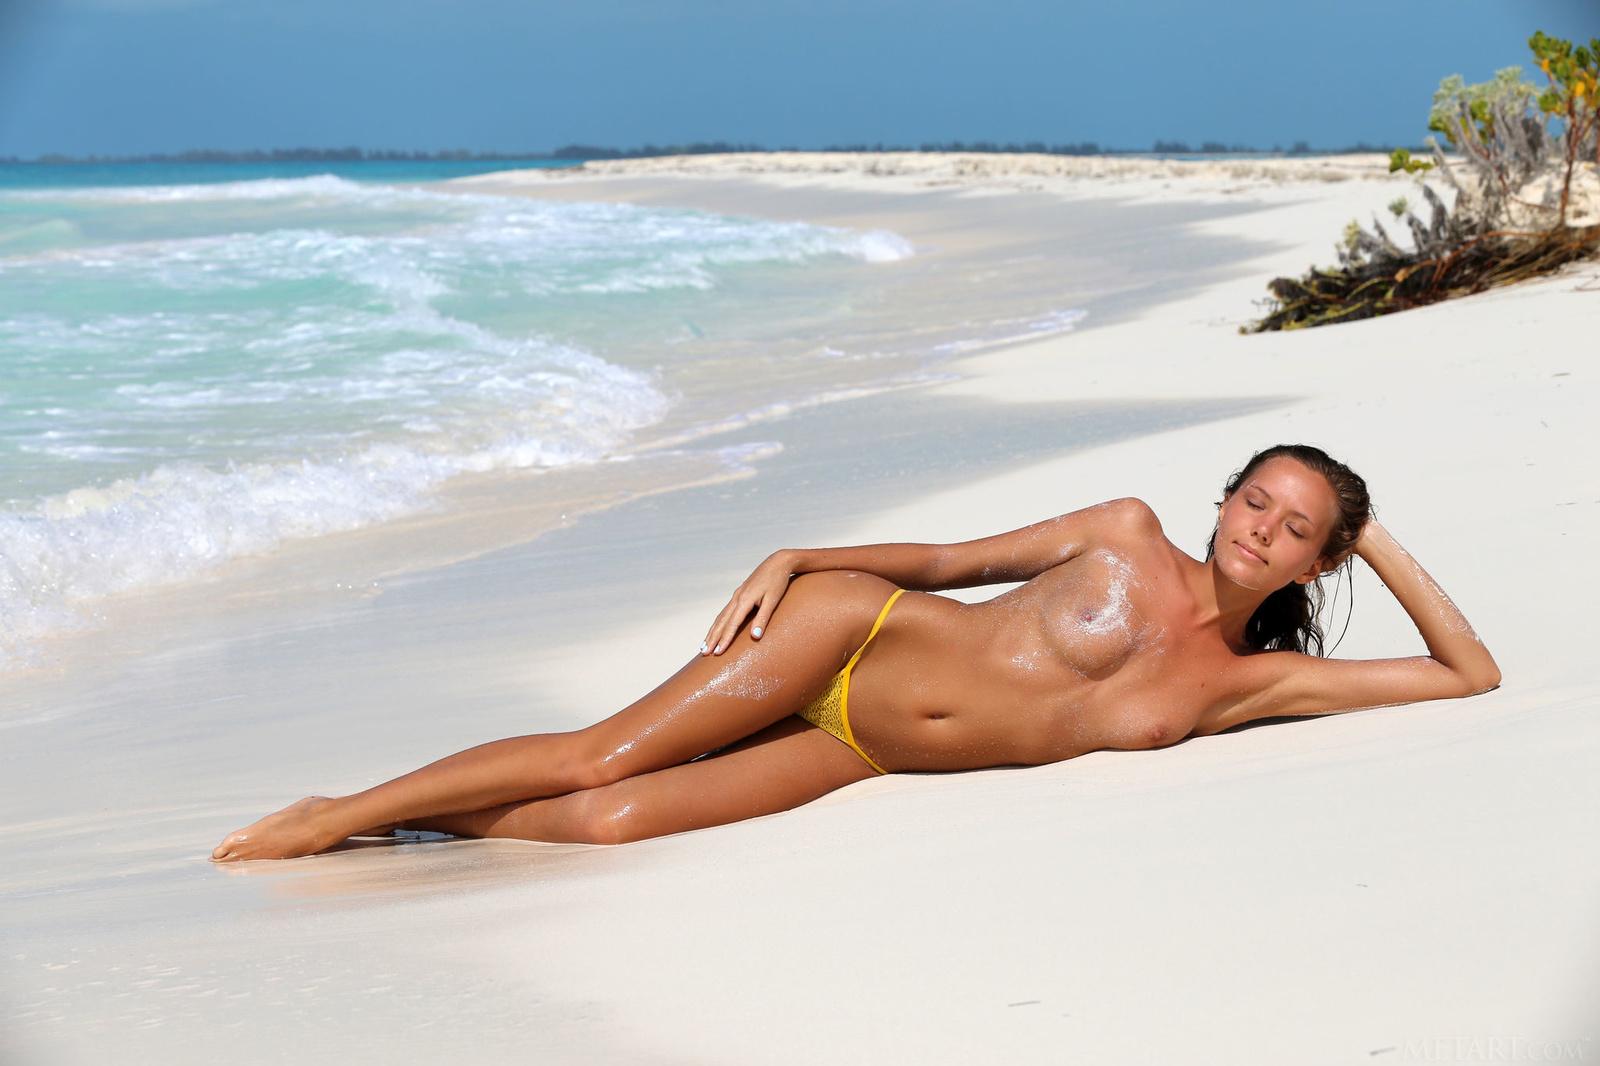 Zdjęcie porno - 086 - Opalona laka na piasku